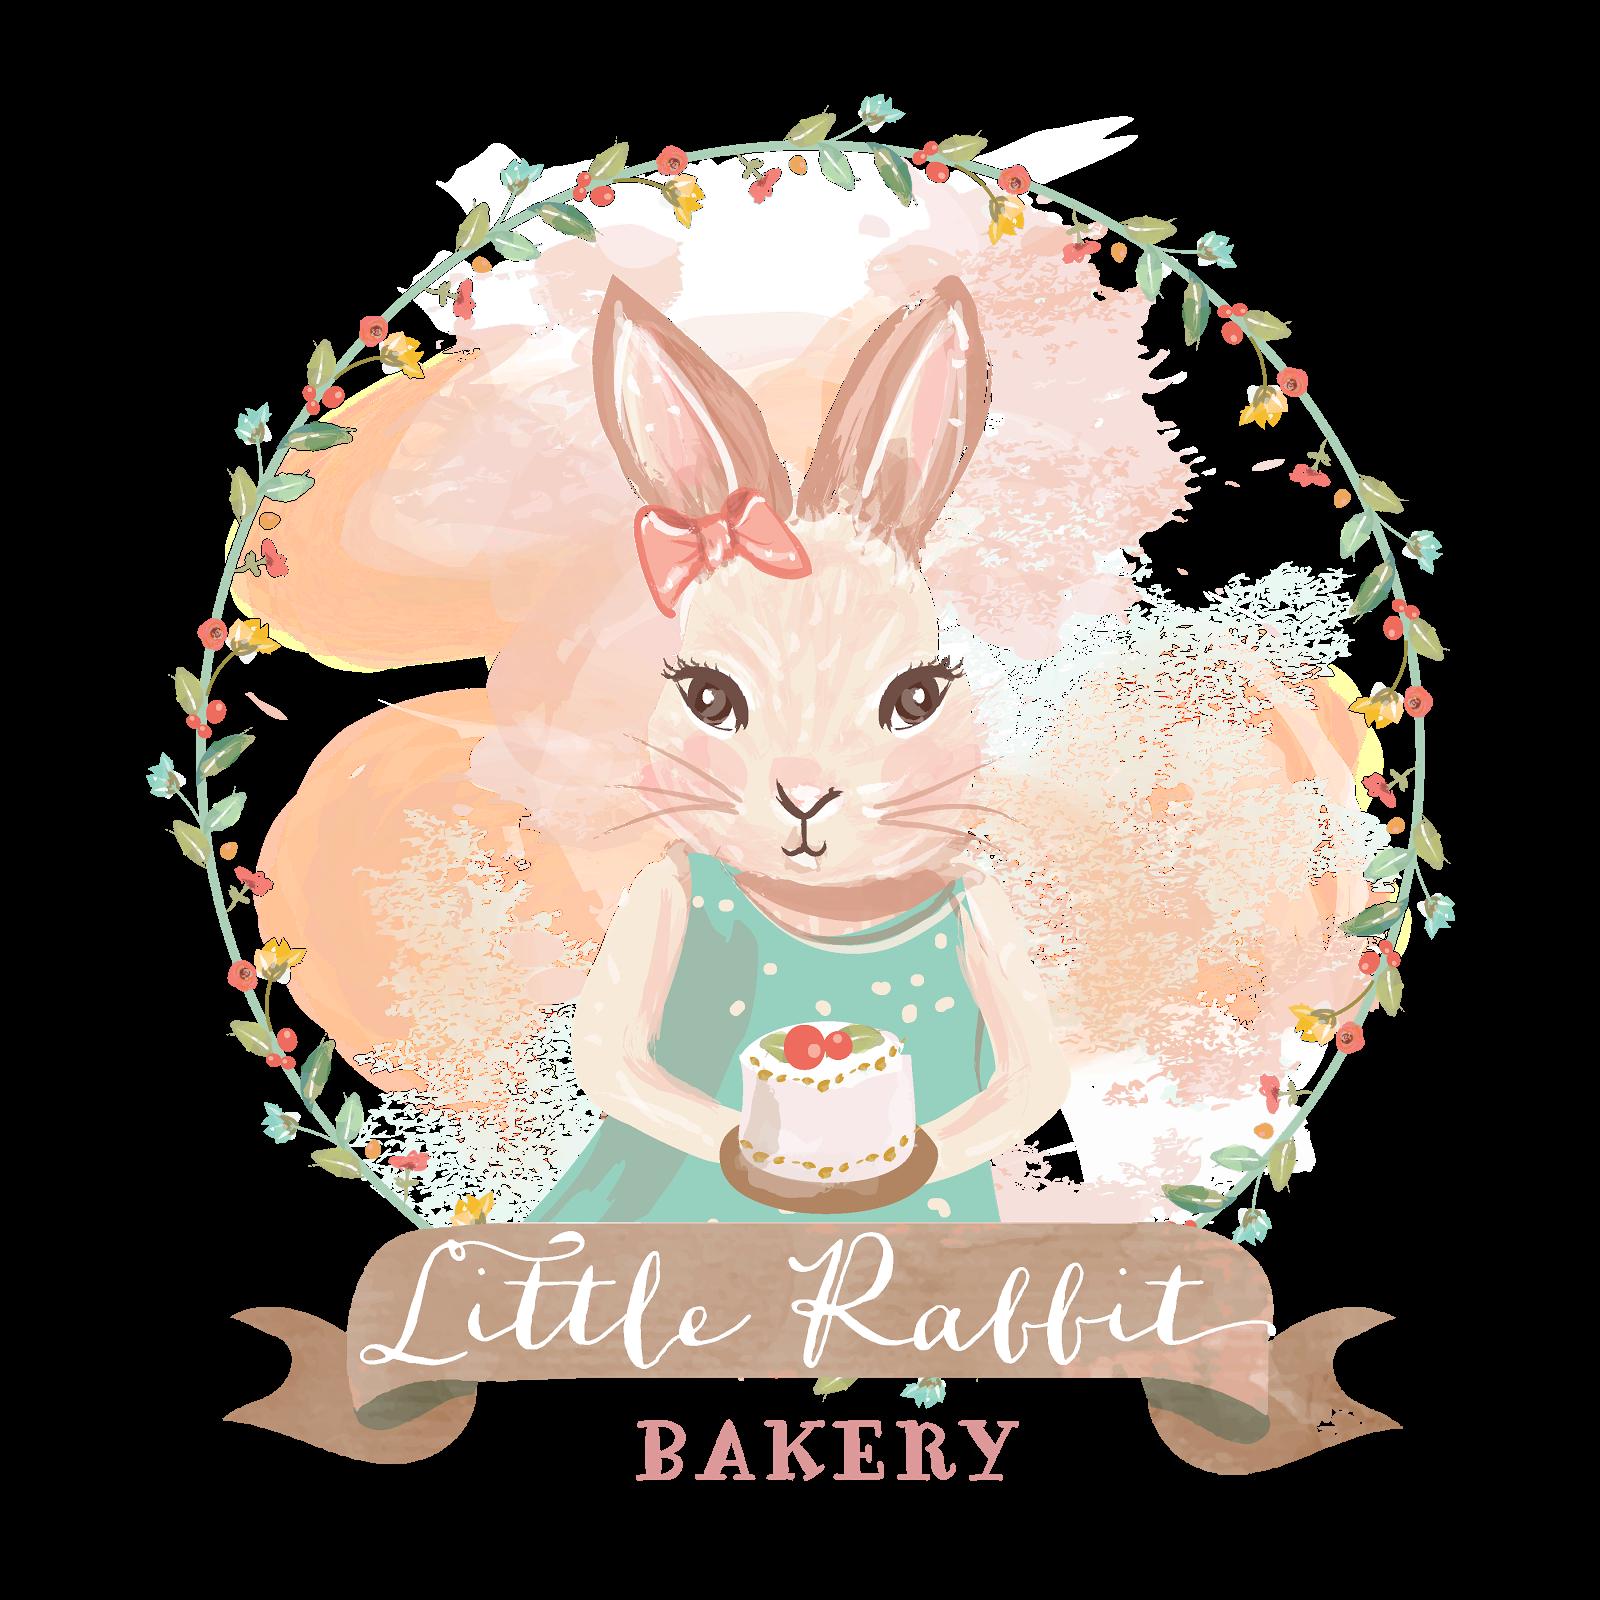 """Little Rabbit Bakery"""